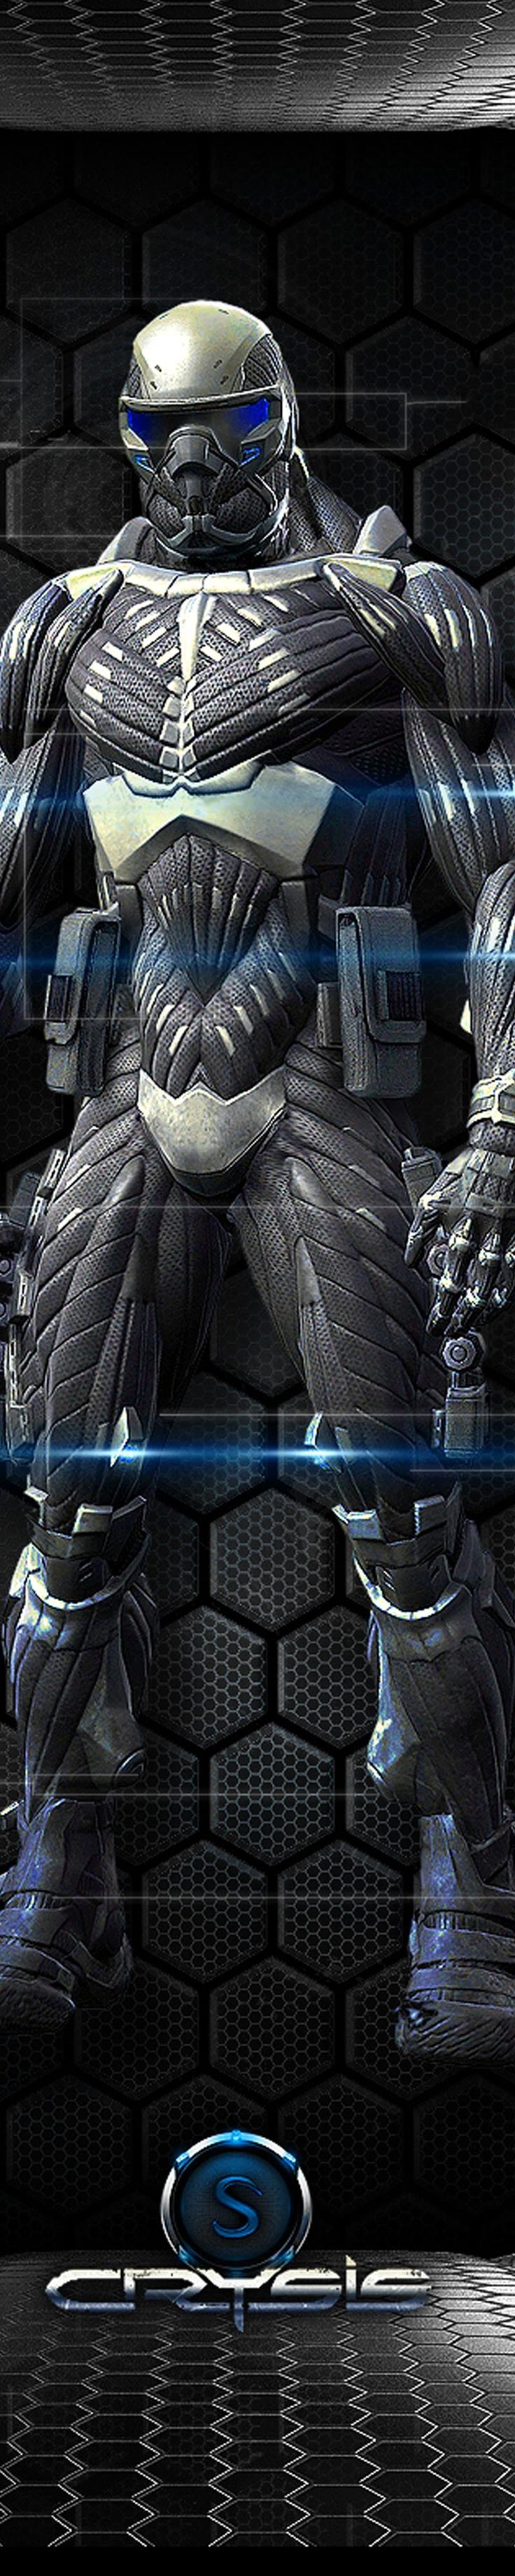 870 best futuristic warriors images on pinterest armors armor